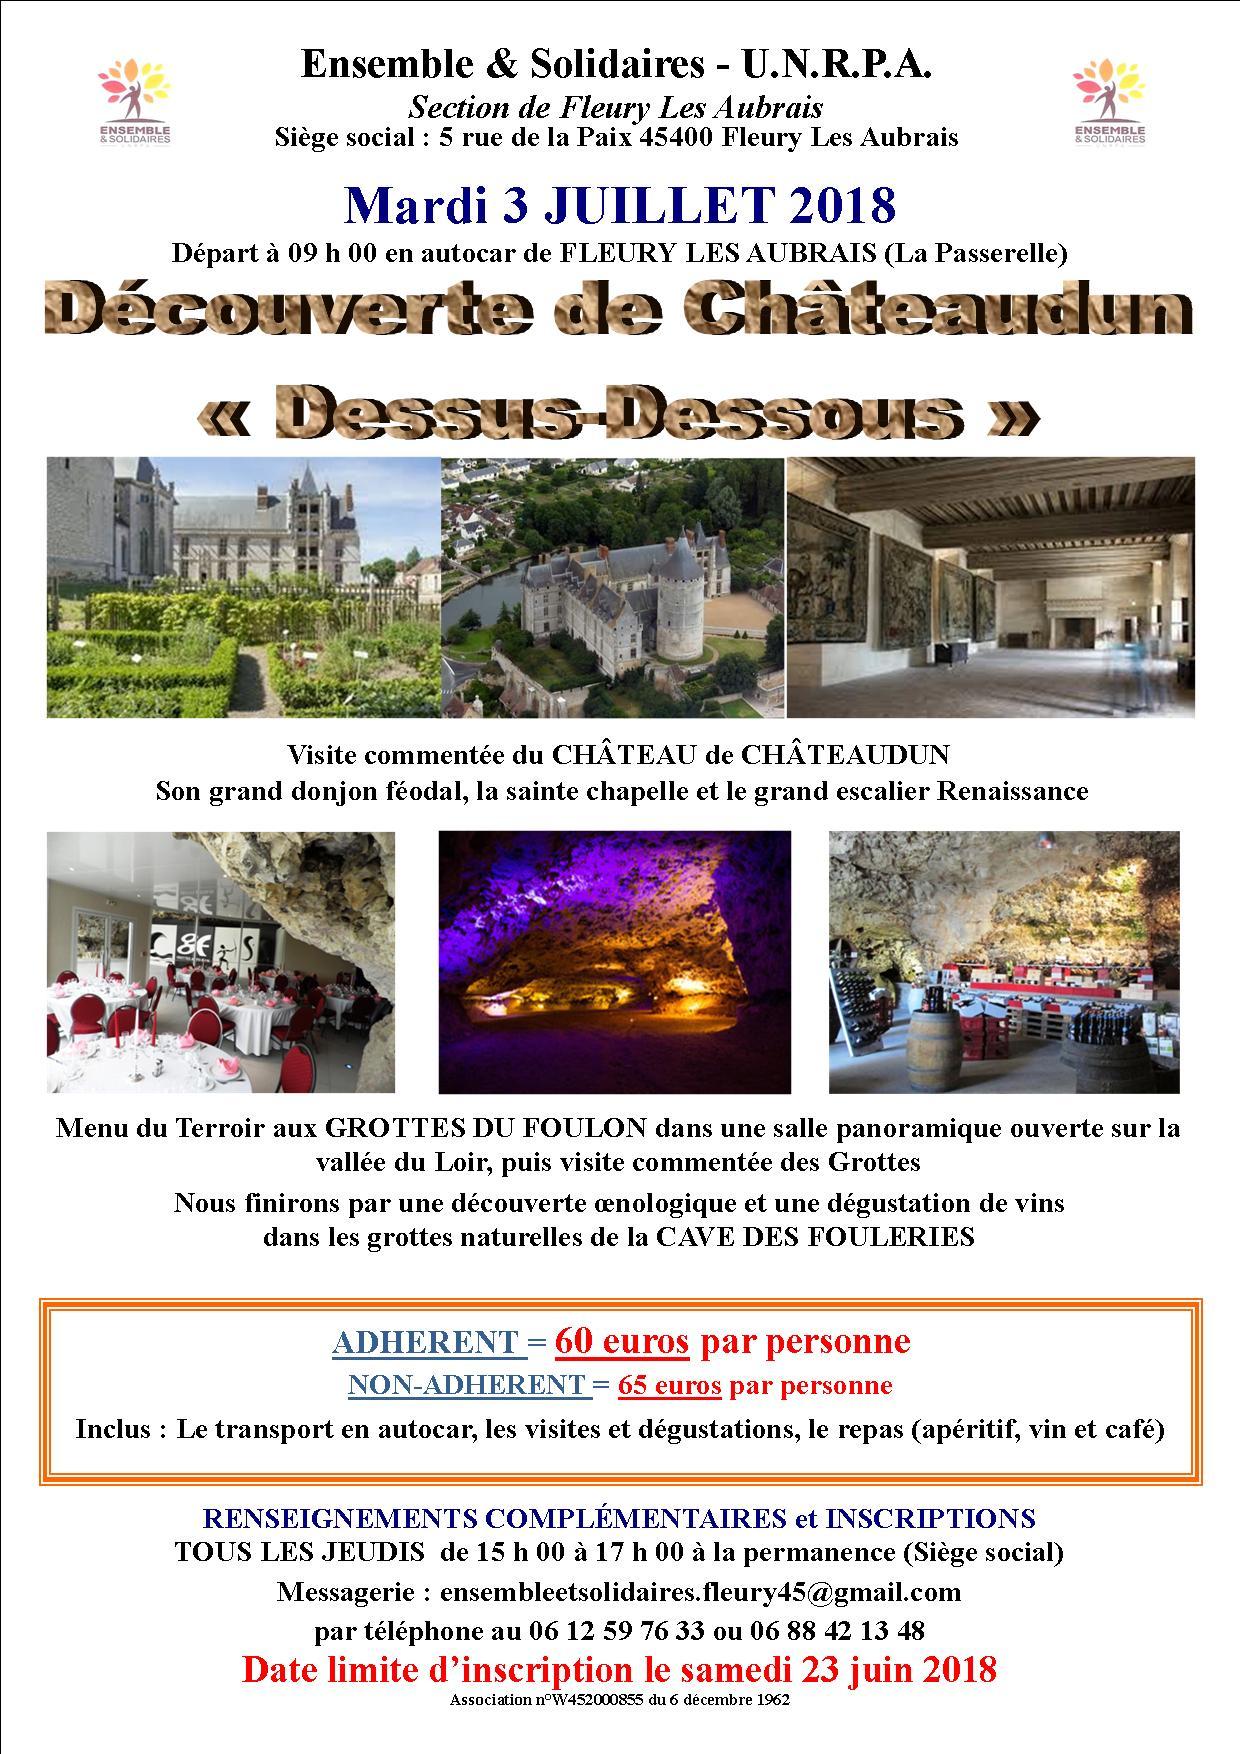 Affiche Chateaudun 03 07 2018.jpg